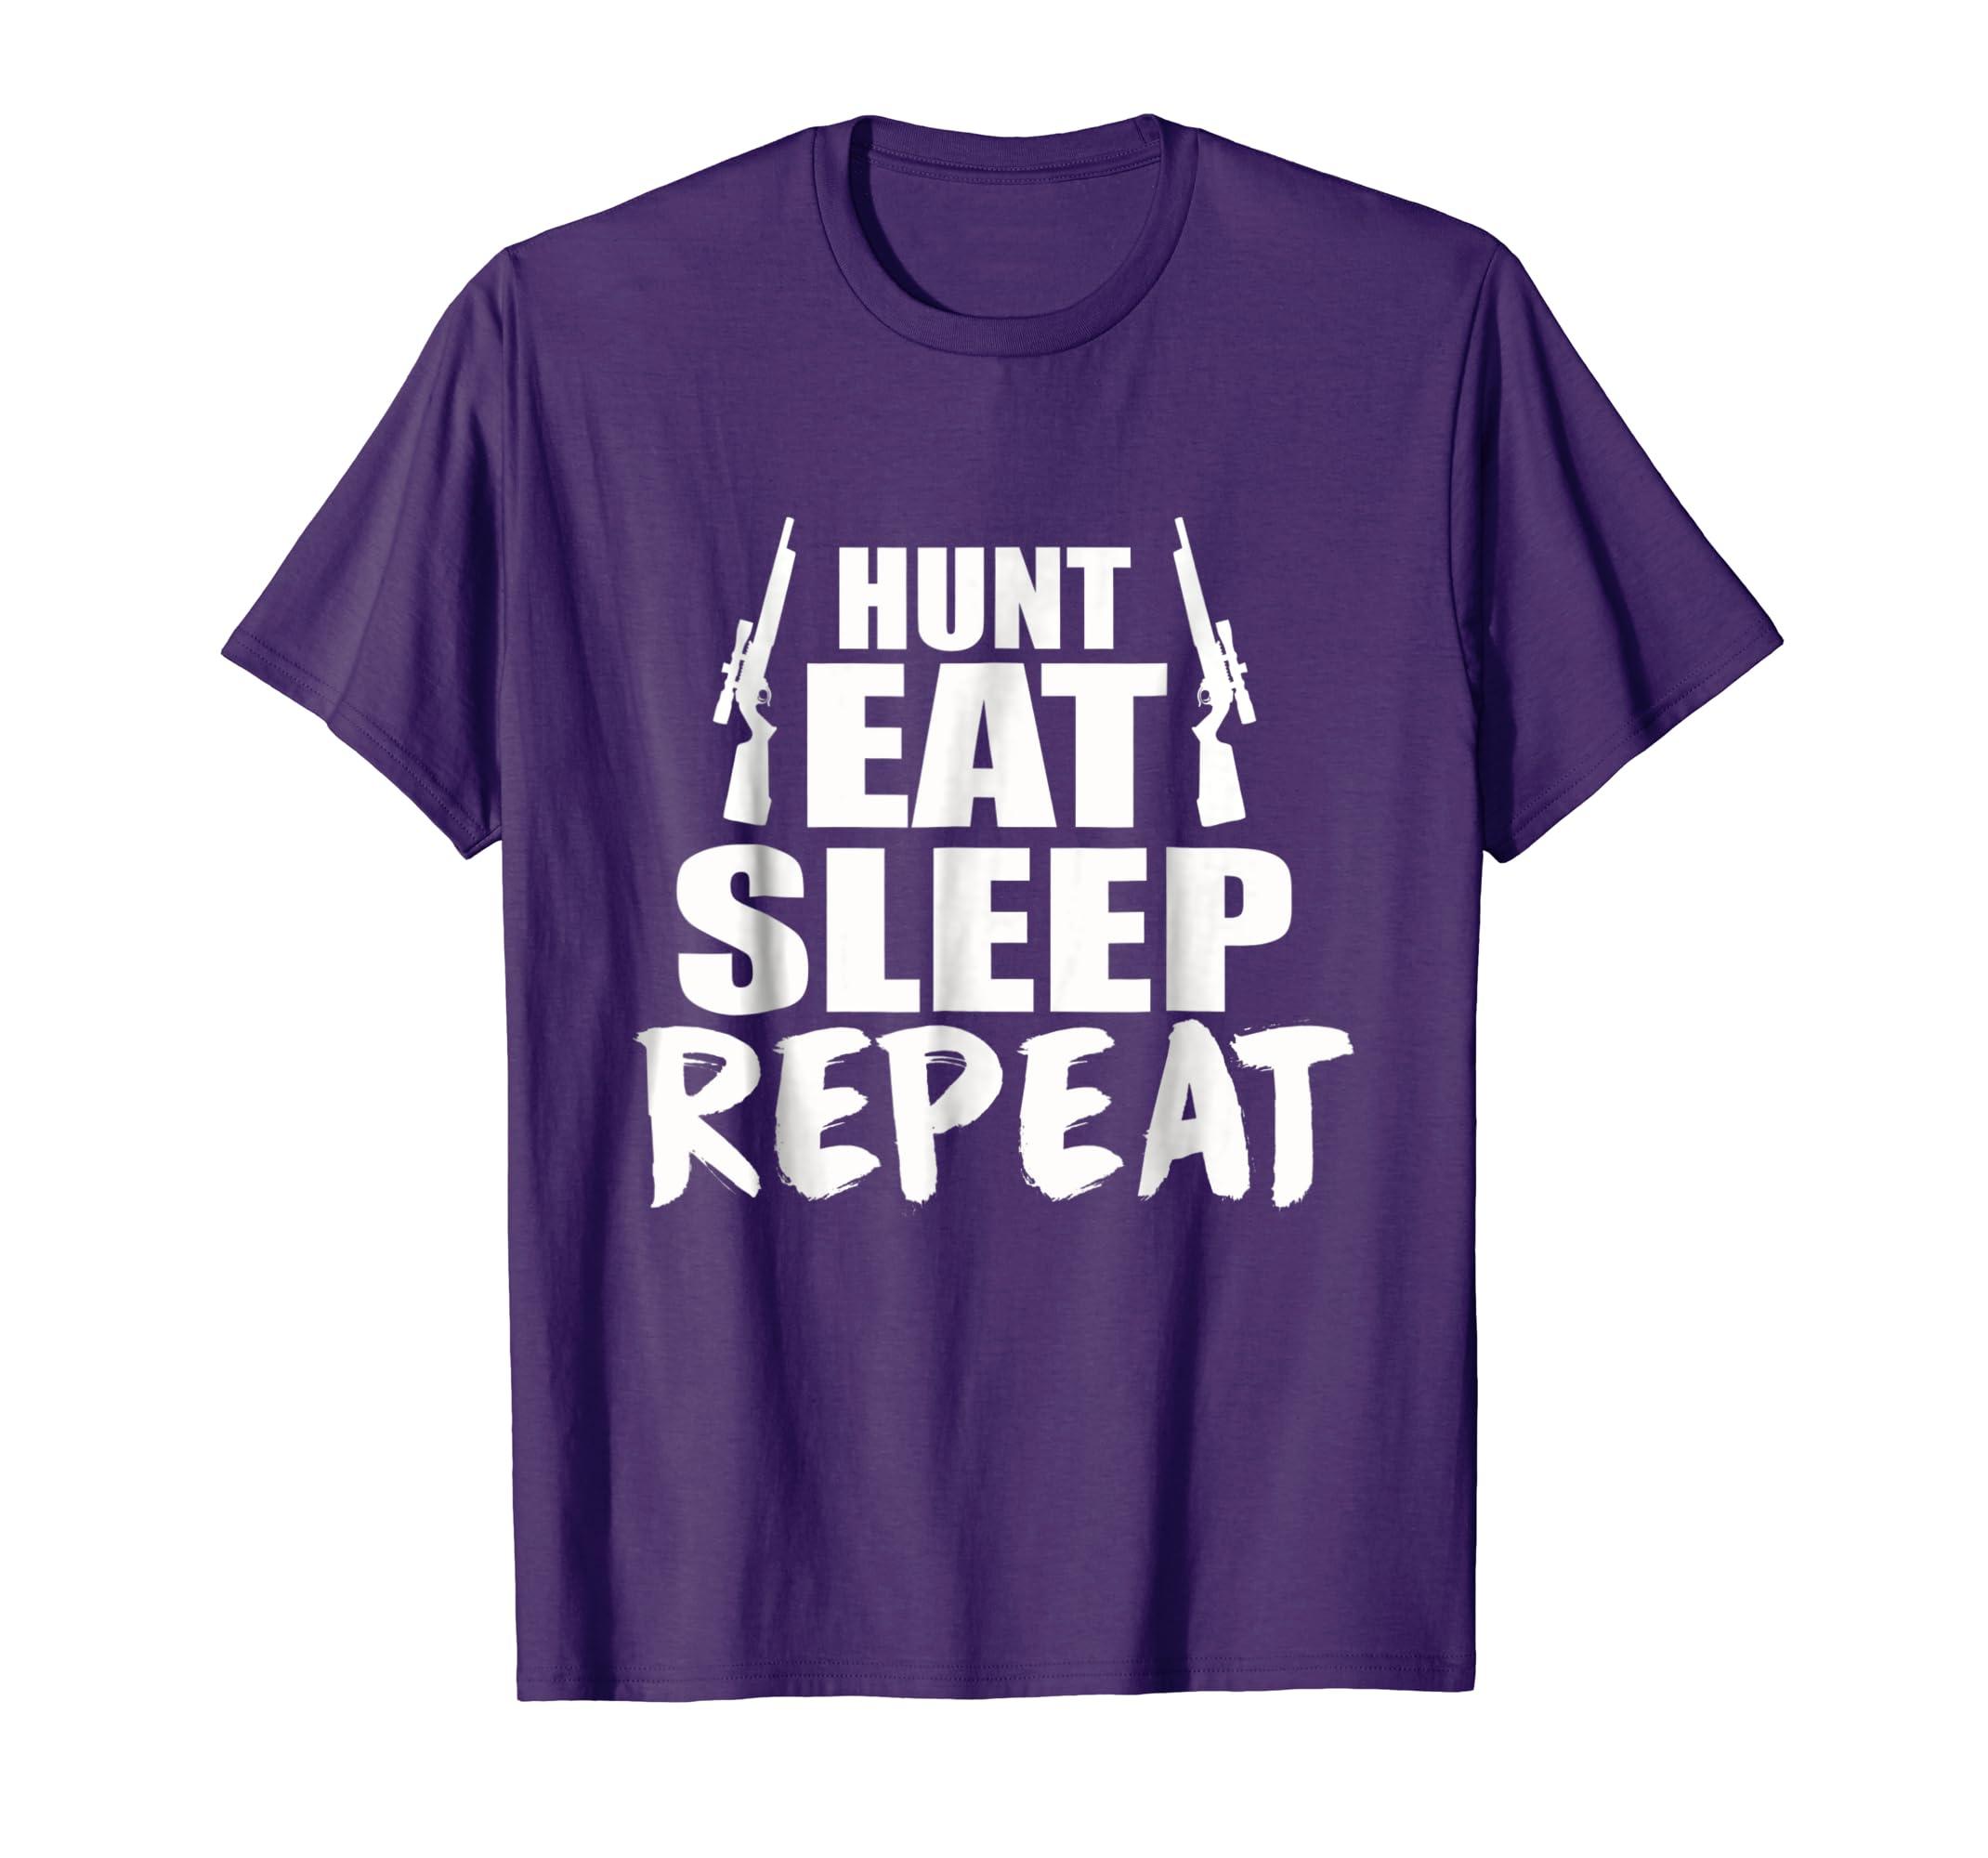 16d4a49b Amazon.com: Hunt Eat Sleep Repeat T-shirt: Clothing